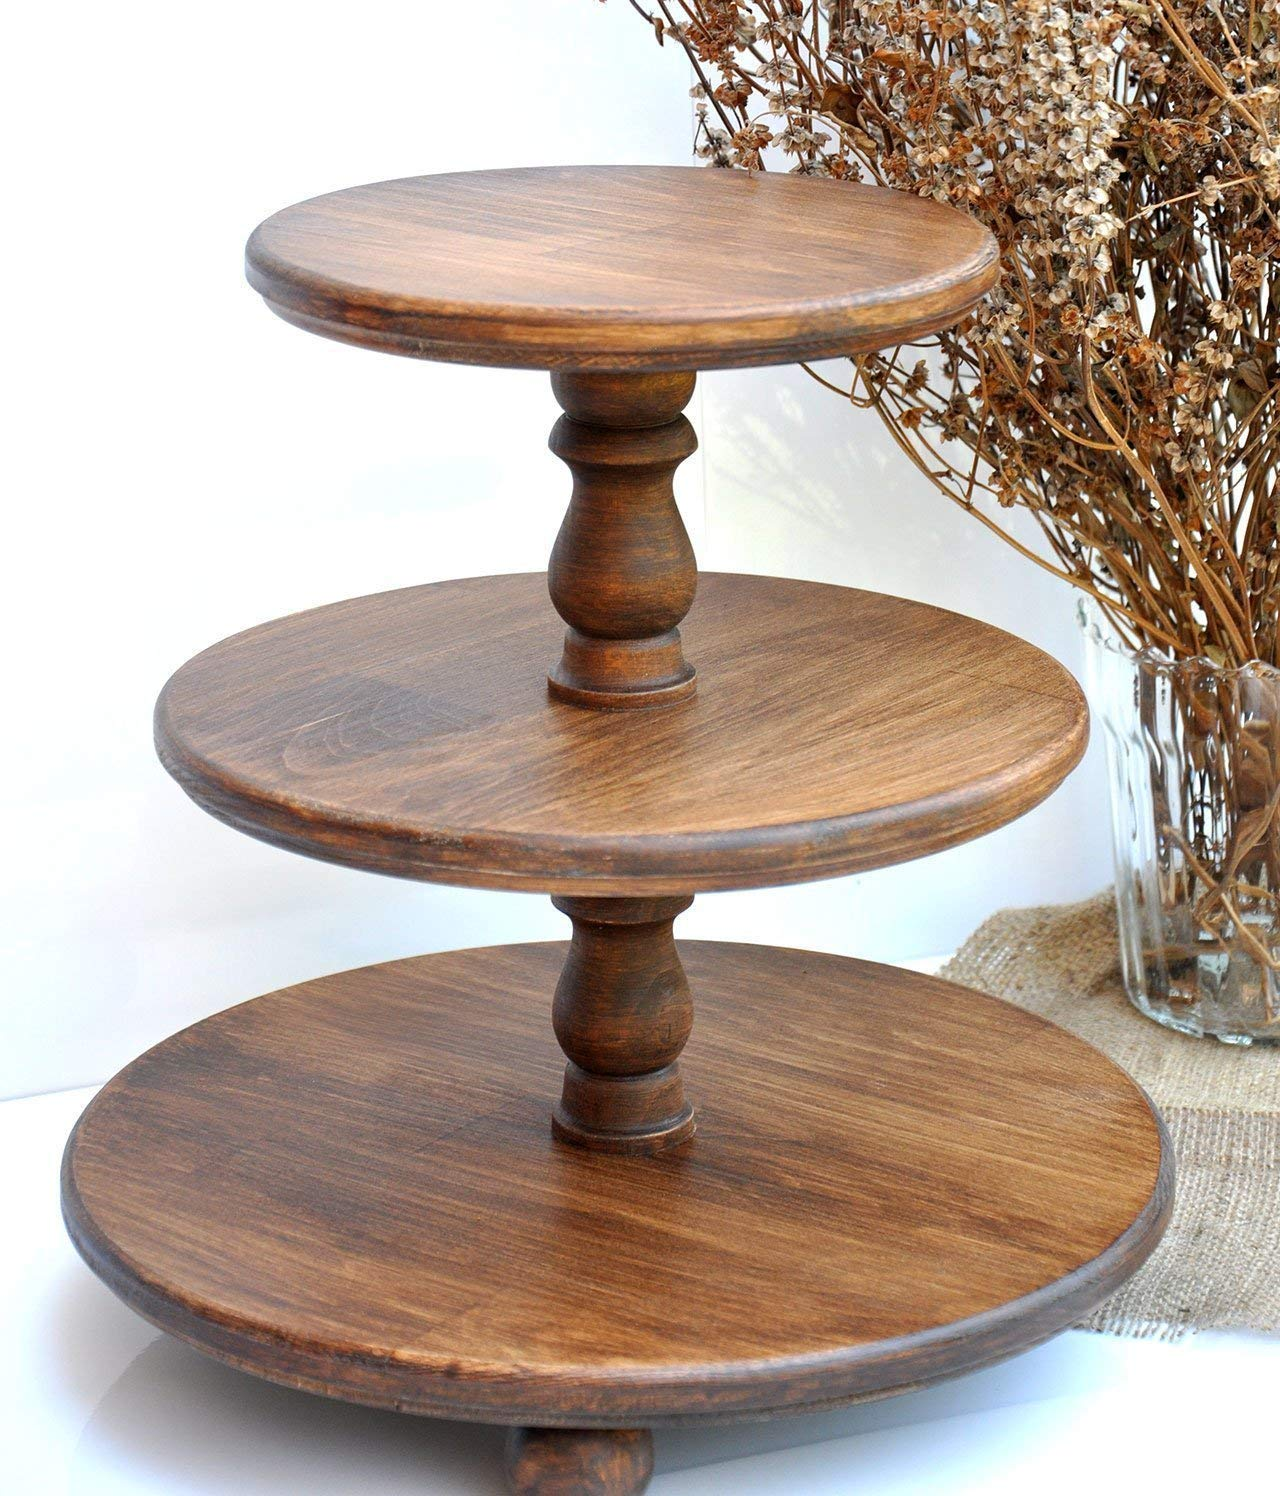 Amazoncom Demountable 3 Tier Wood Rustic Cake Stand For Wedding